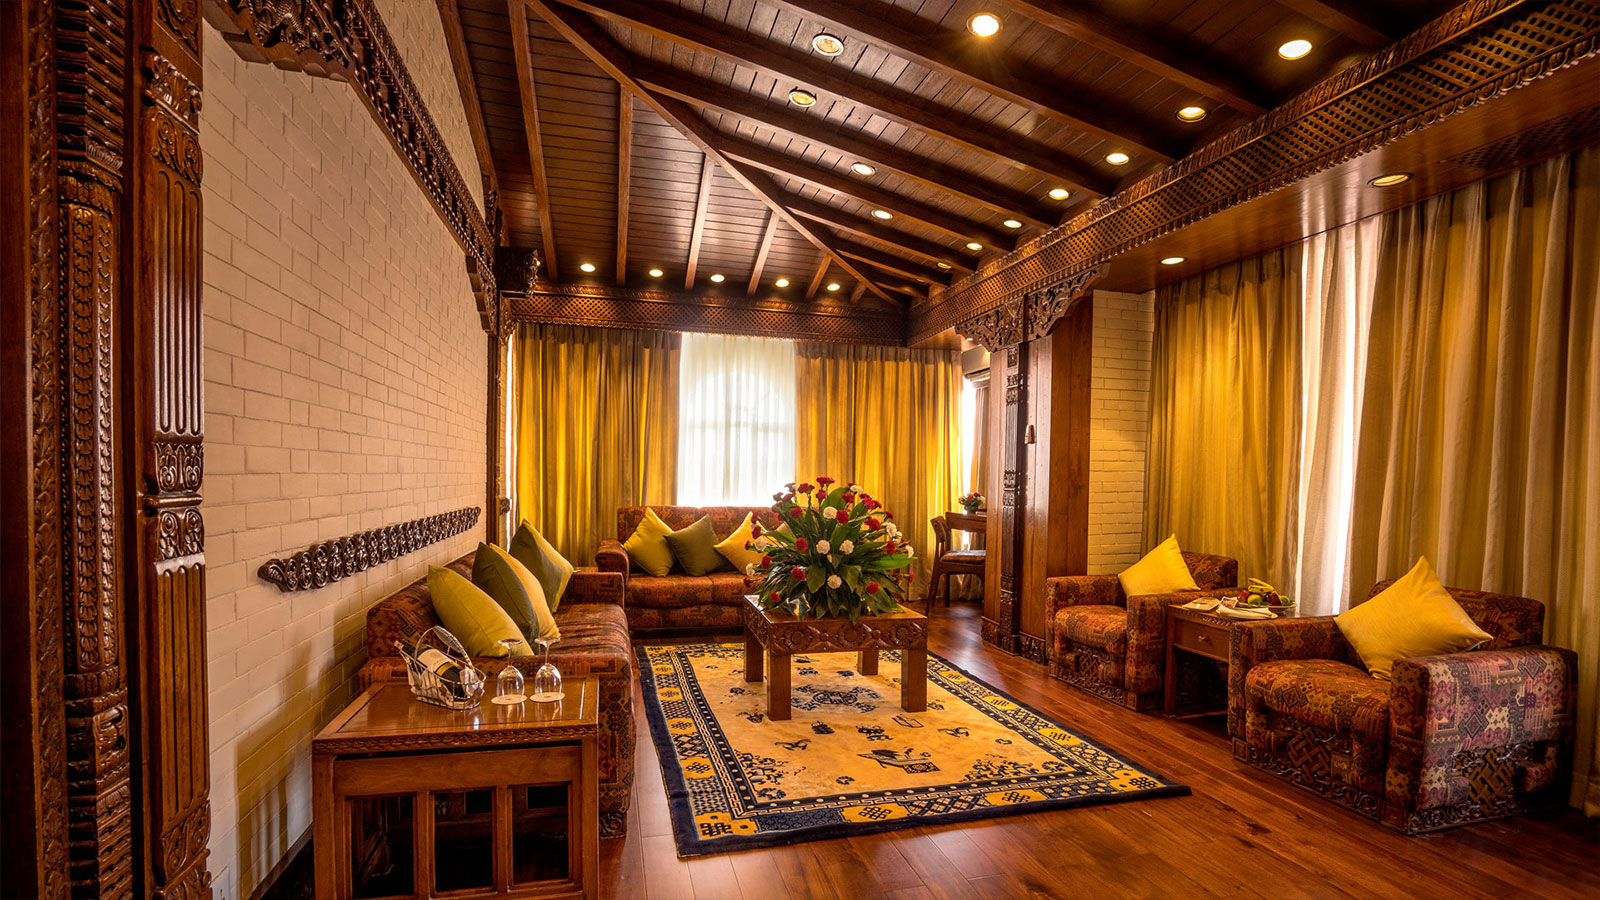 Hotel Yak  U0026 Yeti  Luxury 5 Star Hotel In Kathmandu  Nepal